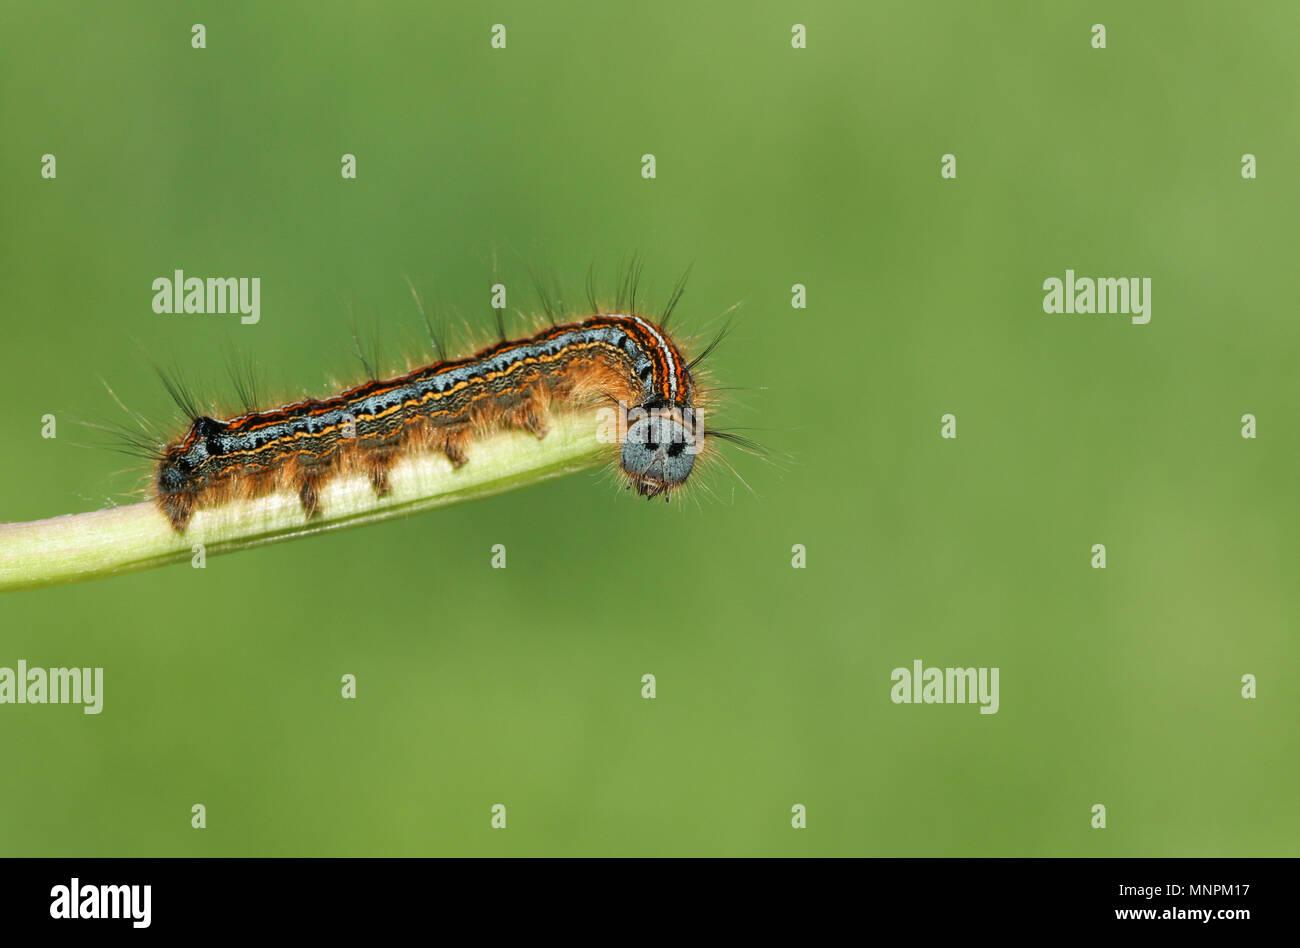 A stunning Lackey Moth Caterpillar  (Malacosoma neustria) on a plant stem. - Stock Image